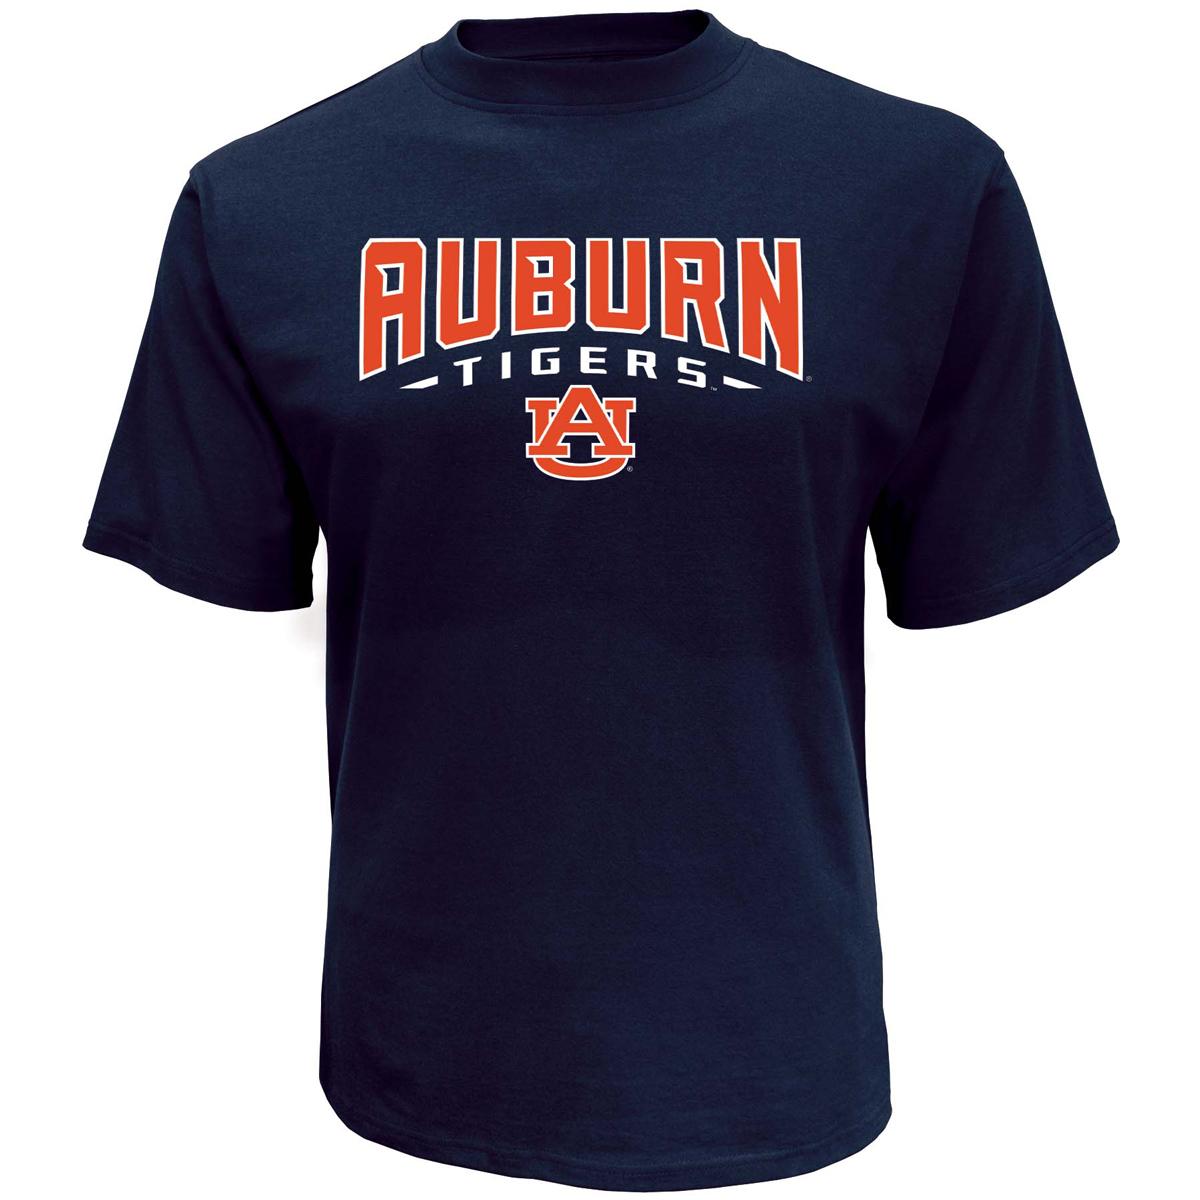 Men's Auburn College Classic Arch Short Sleeve T-Shirt, Navy, swatch